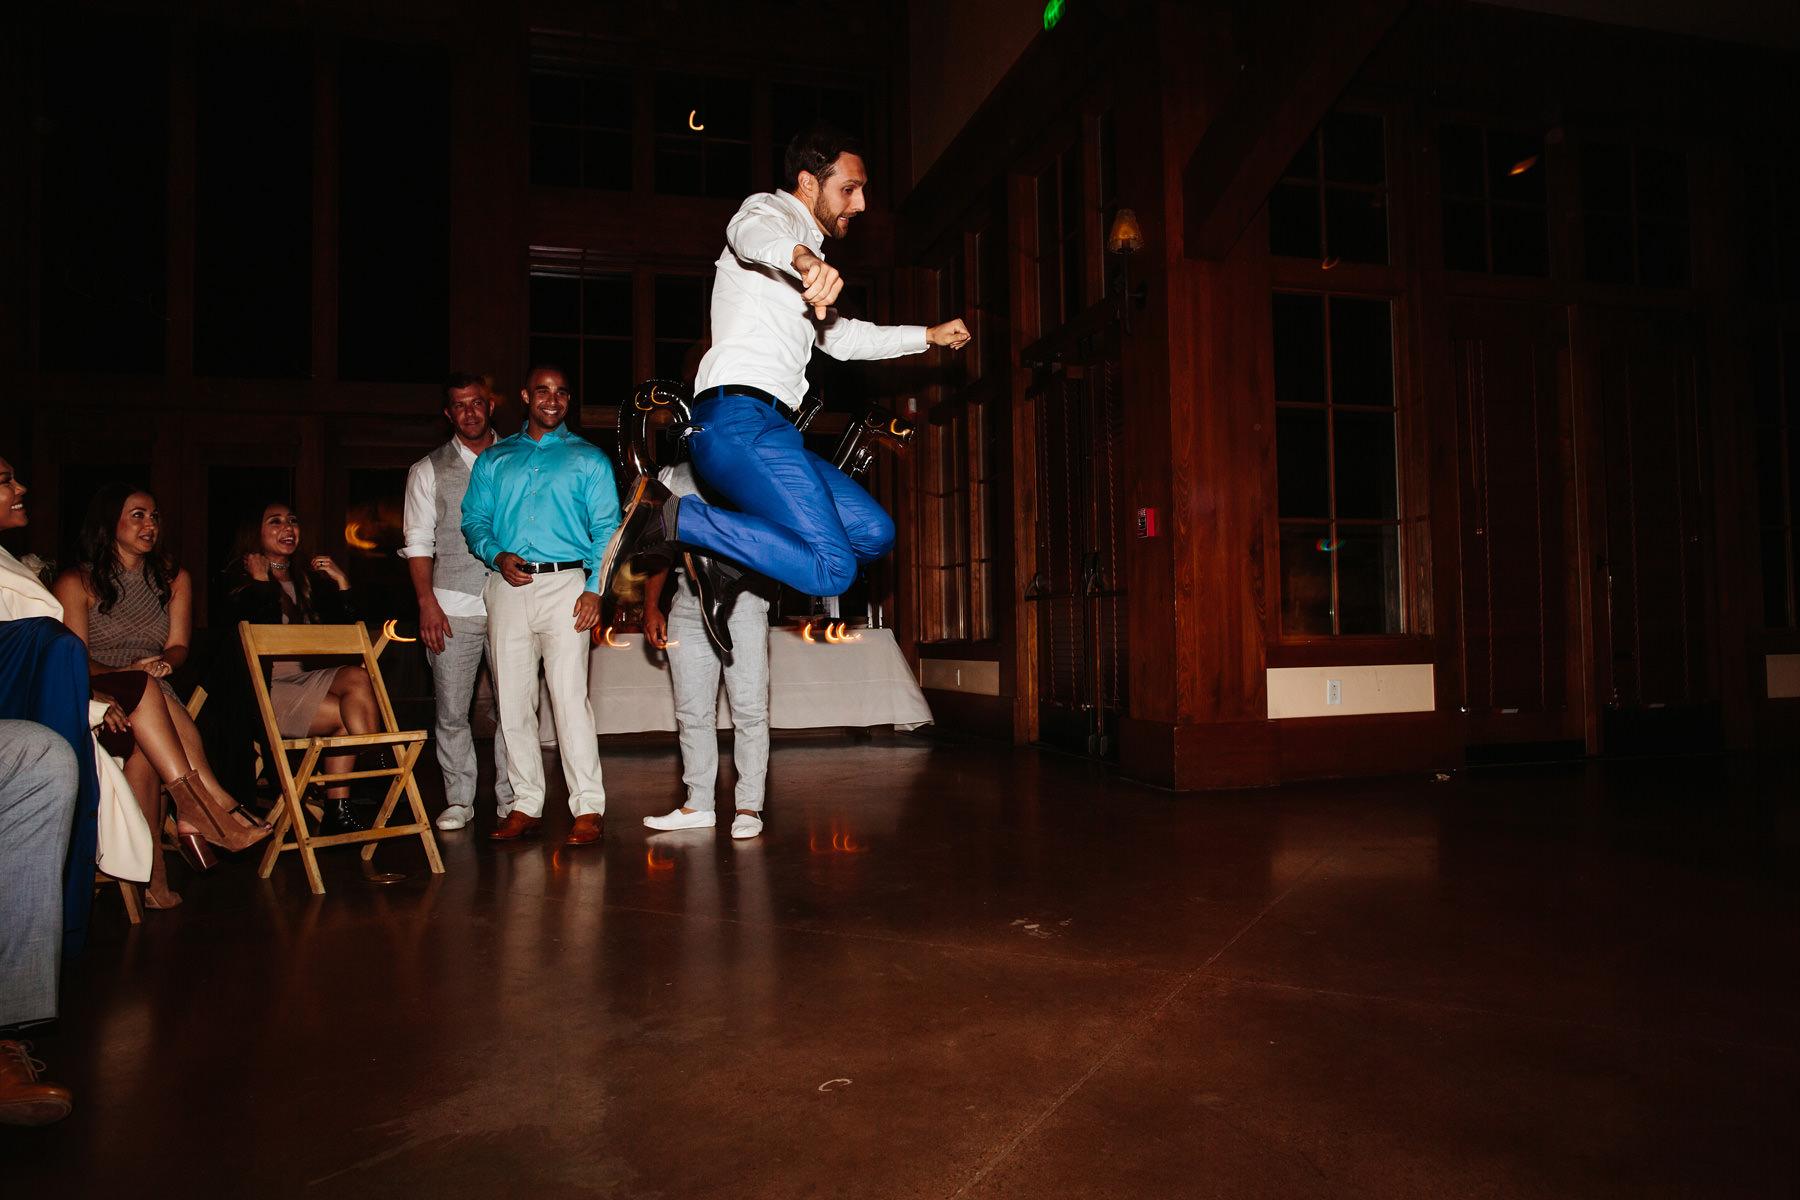 Vail Colorado Wedding Deck_ Kindling Wedding Photography105.JPG